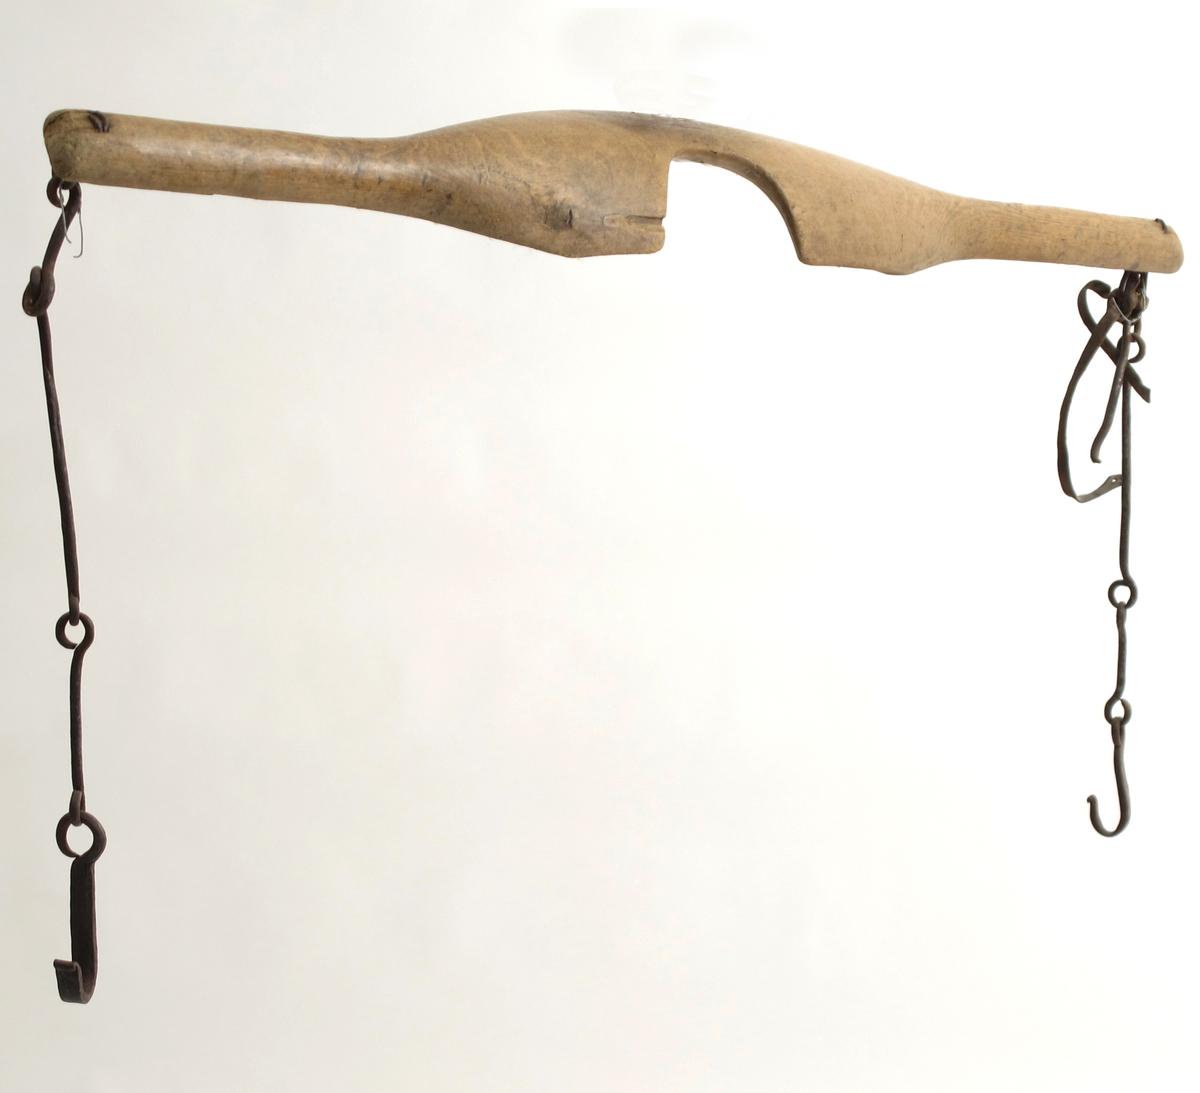 Vassåk, skåert av løvtre.  Langt trestykke med ovalt skålformet midtstykke  med en halvrund innskjæring til nakken. I hver  ende en   jernring  med fireleddet krok. I den ene siden også en smal  lærrem. På den buede side Innskåret:   T. U.  Tilstand: god, krokene rustne.